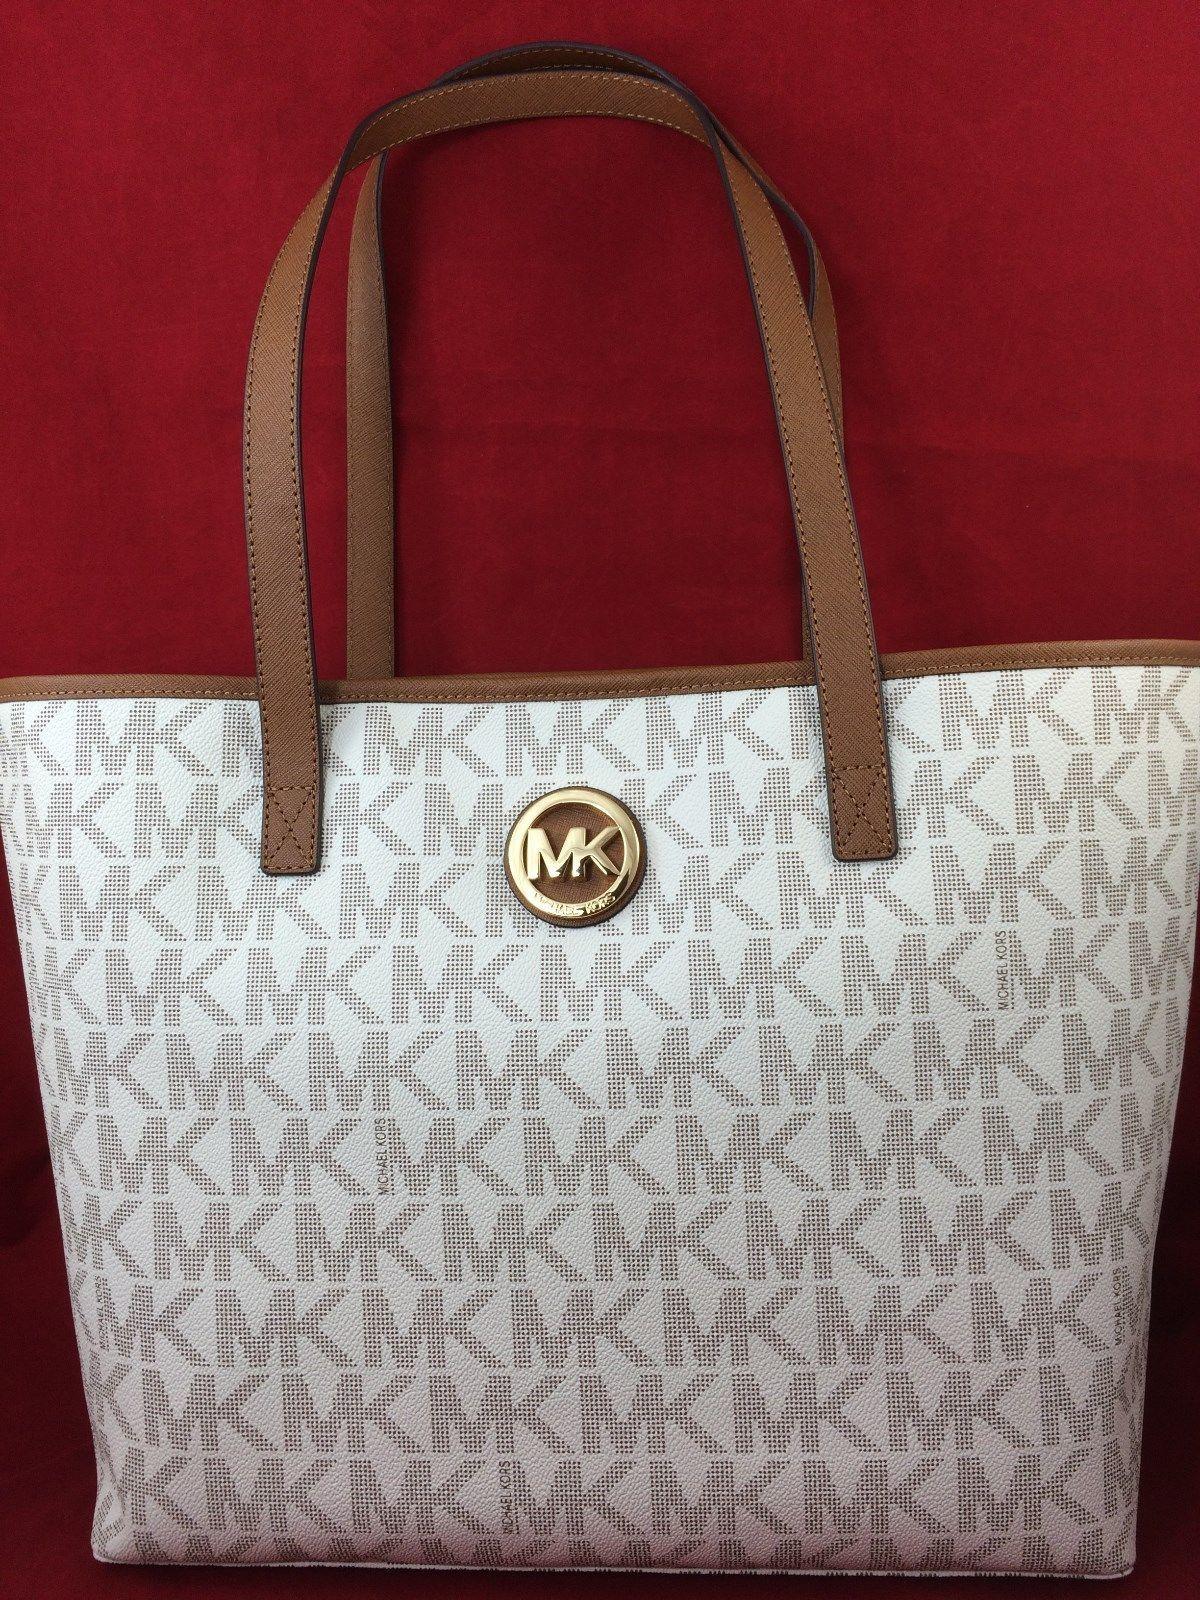 01dc6f3abf61f New Michael Kors MK Jet Set Travel Tote Bag Handbag Purse MD PVC Vanilla